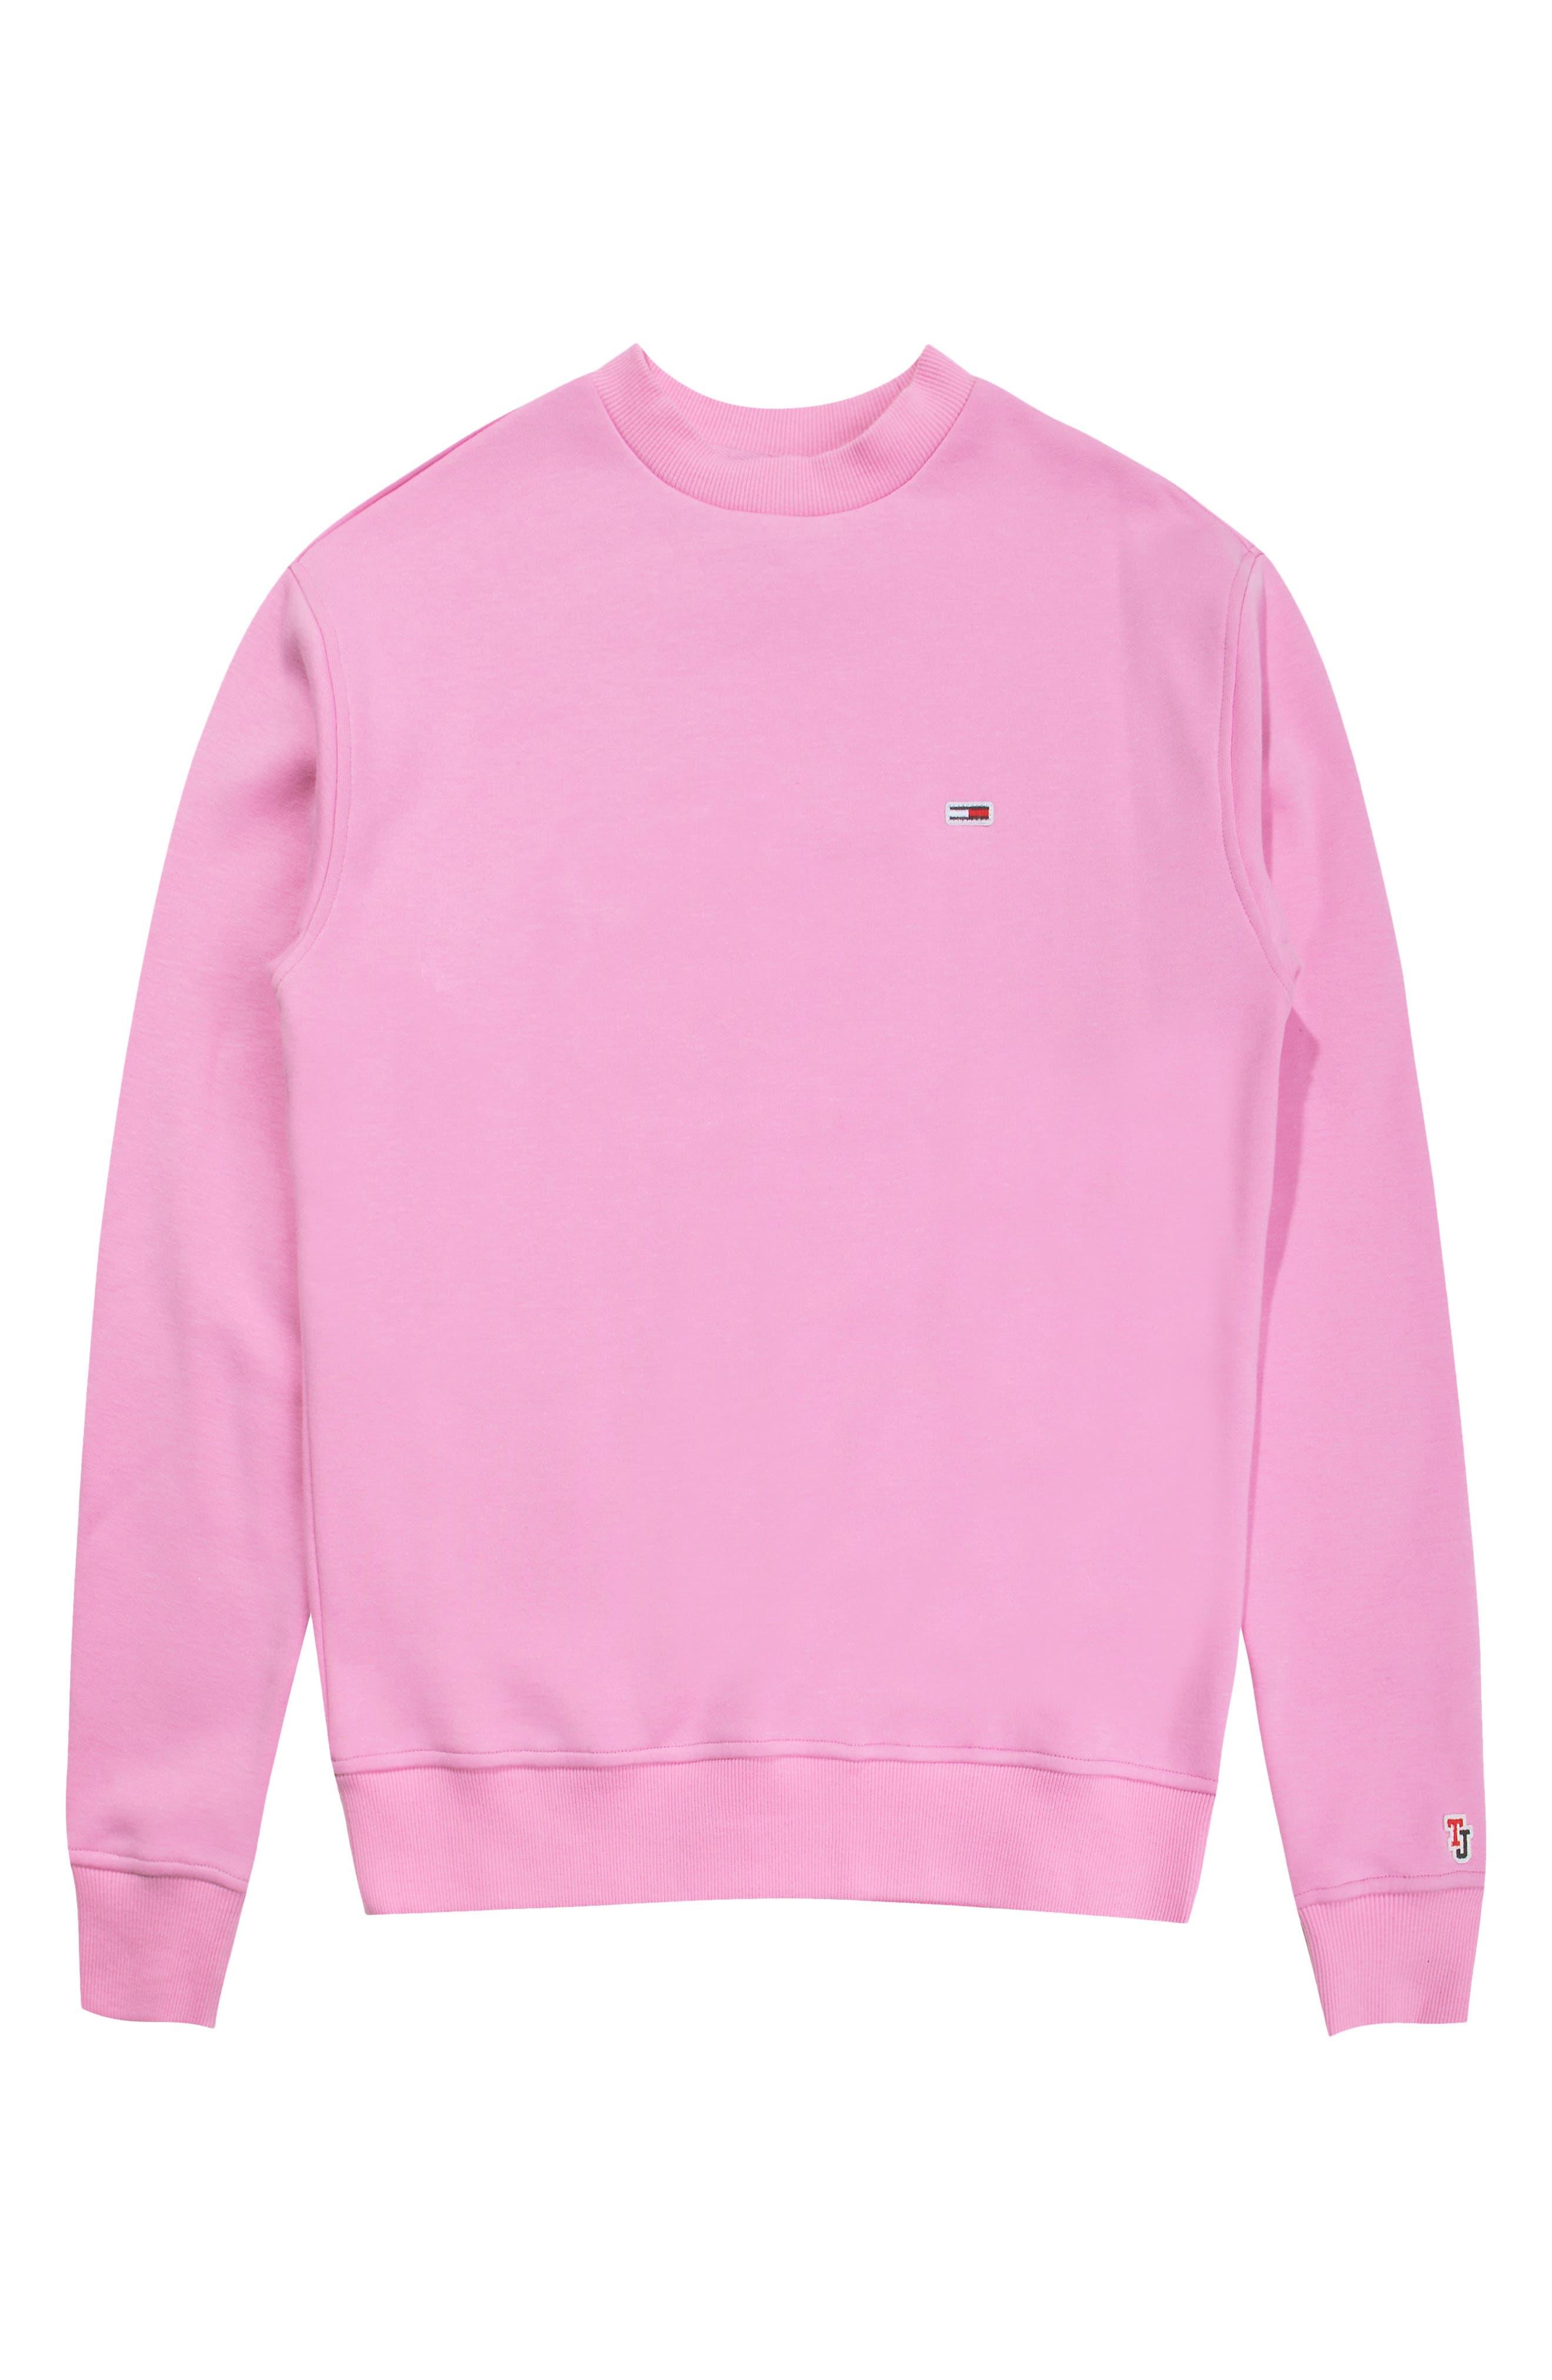 TOMMY JEANS,                             TJW Tommy Classics Sweatshirt,                             Alternate thumbnail 4, color,                             LILAC CHIFFON